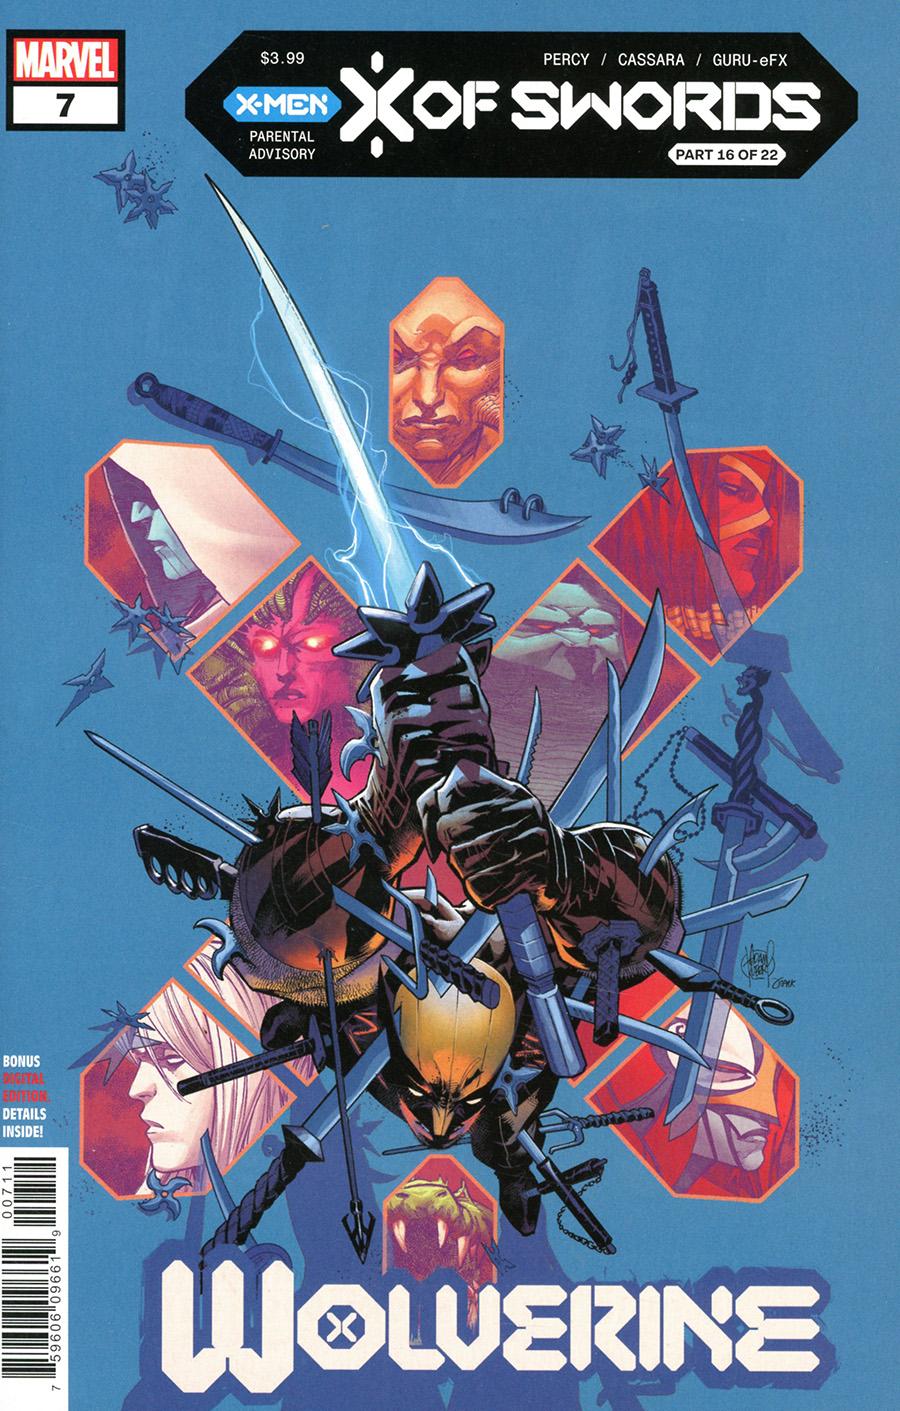 Wolverine Vol 7 #7 Cover A 1st Ptg Regular Adam Kubert Cover (X Of Swords Part 16)